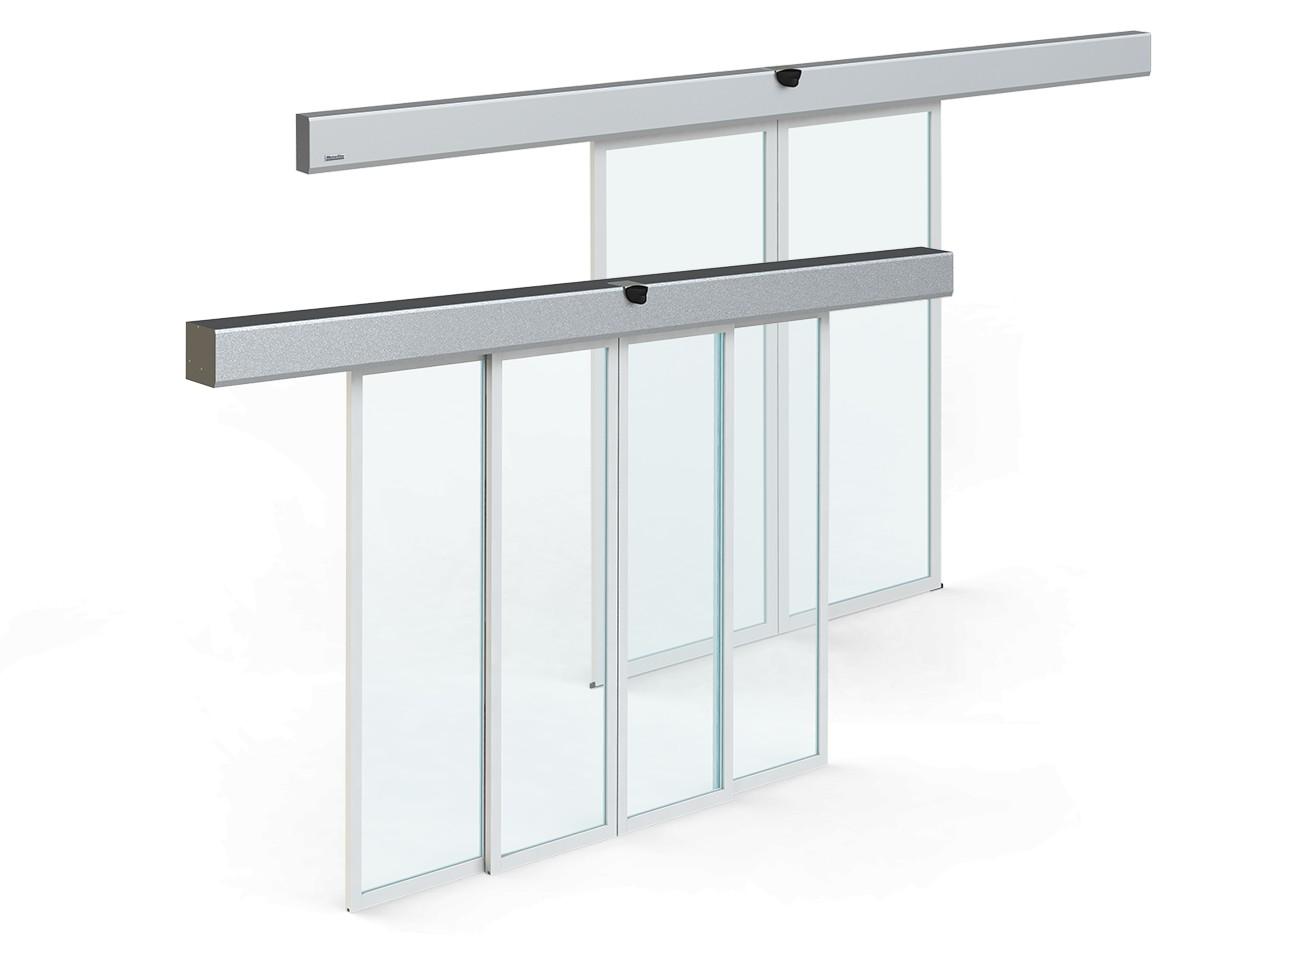 kit para puerta corredera automática de cristal